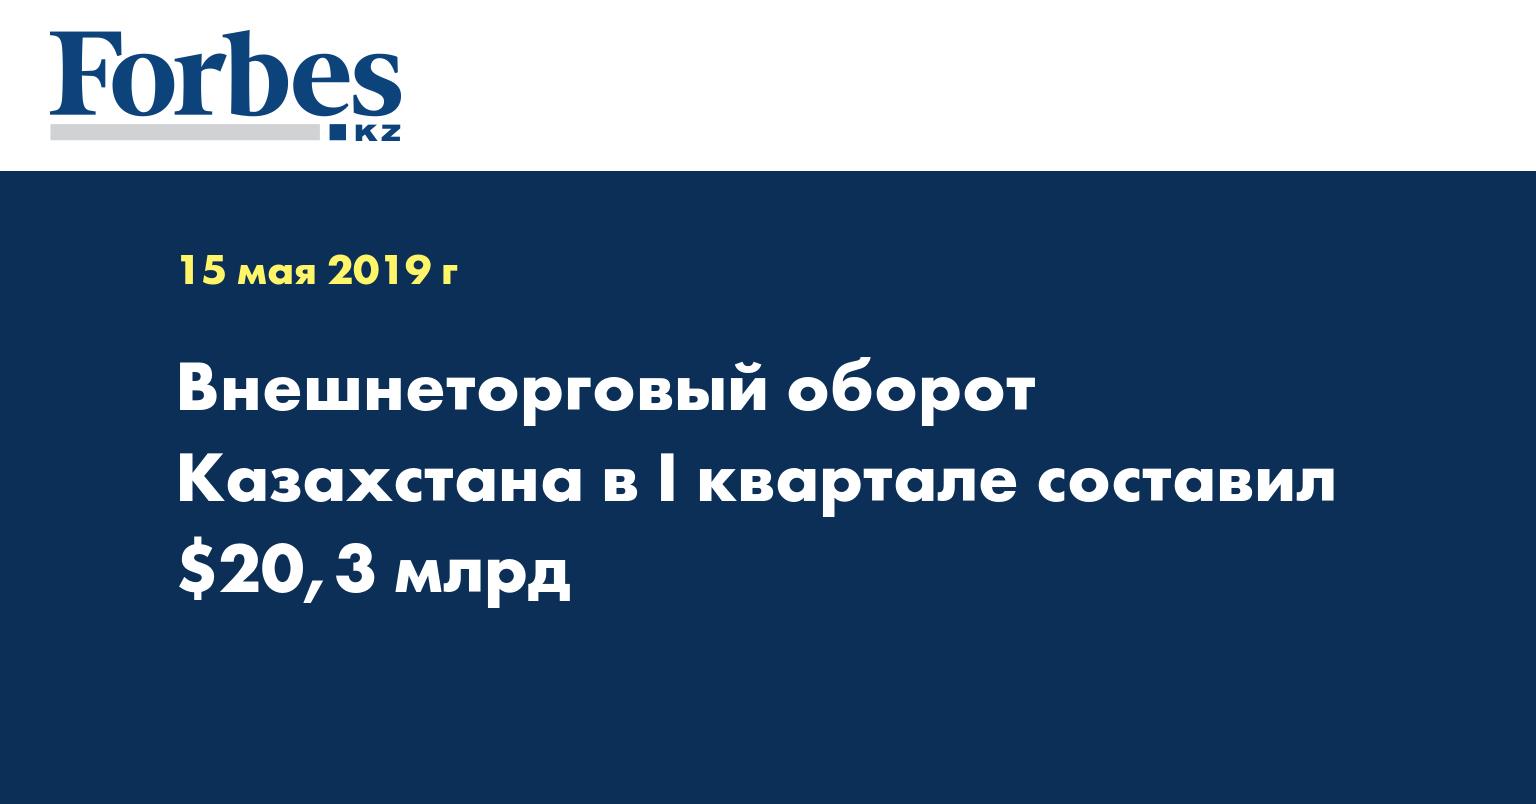 Внешнеторговый оборот Казахстана в I квартале составил $20,3 млрд